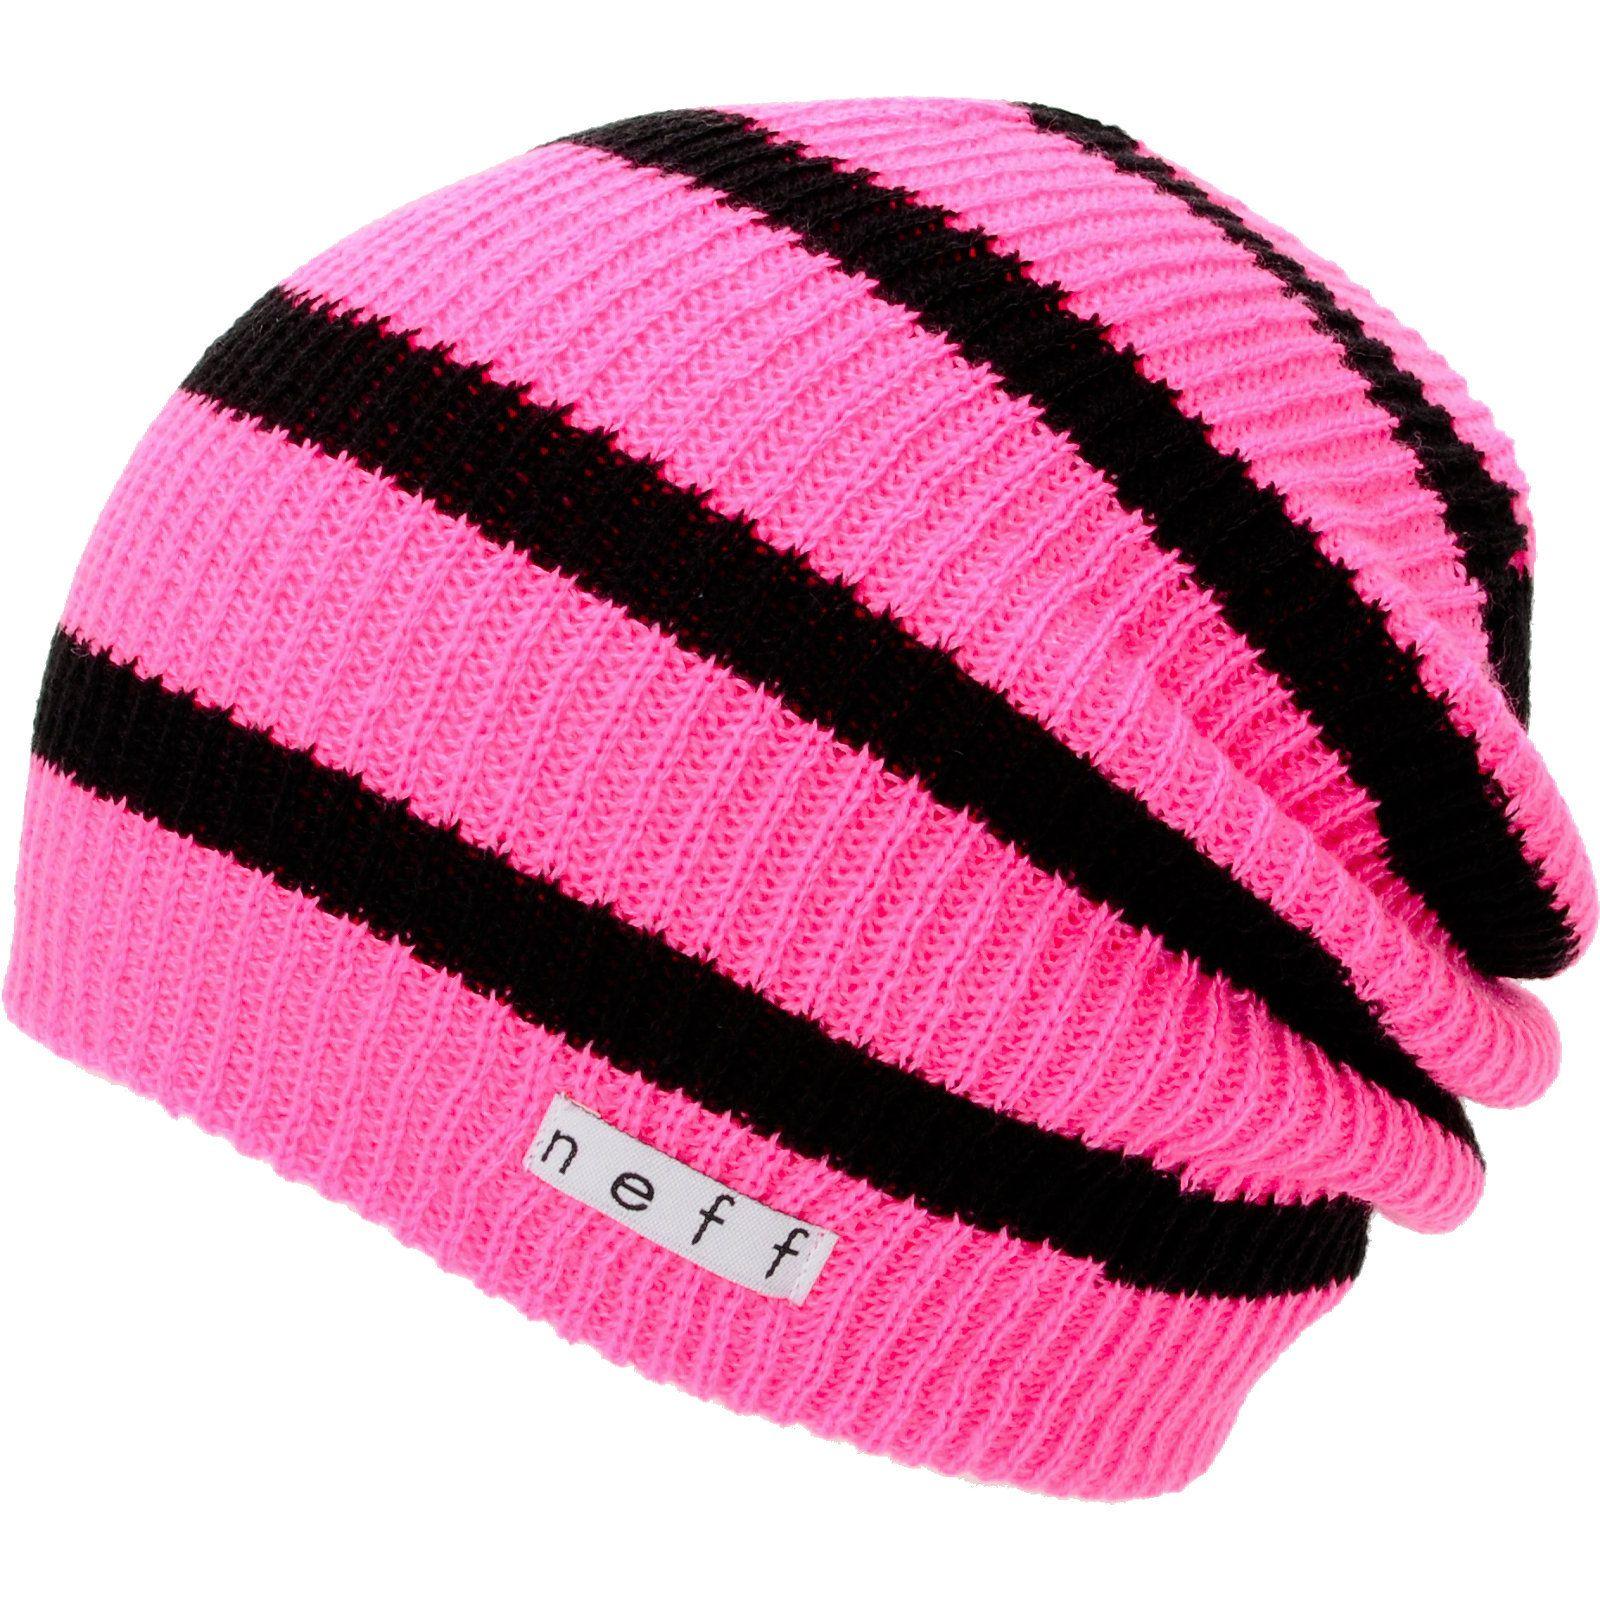 6c999b9a3f9 Neff Daily Pink   Black Stripe Beanie at Zumiez   PDP